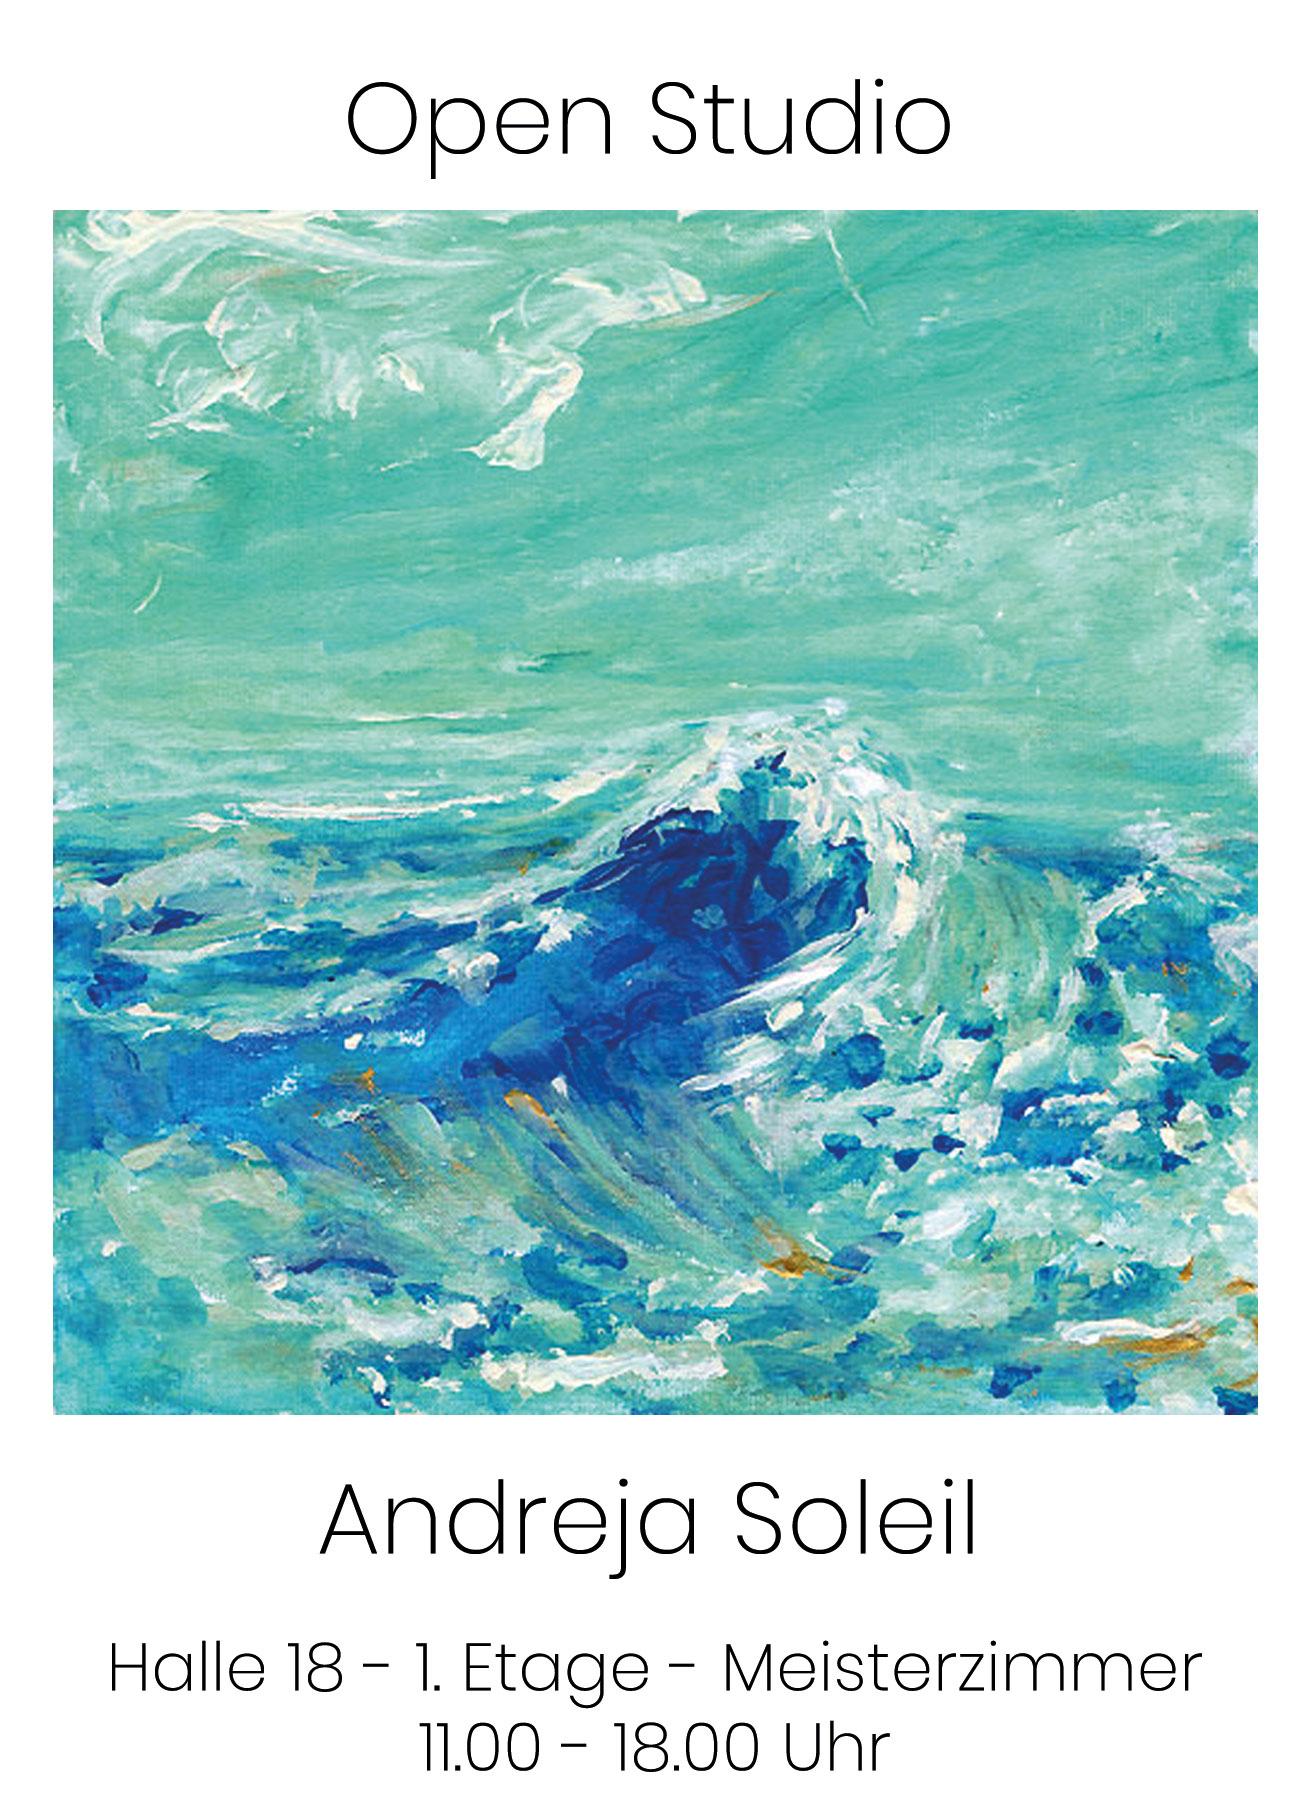 Baumwollspinnerei Frühjahrsrundgang Offenes Atelier – Open Studio Andreja Soleil